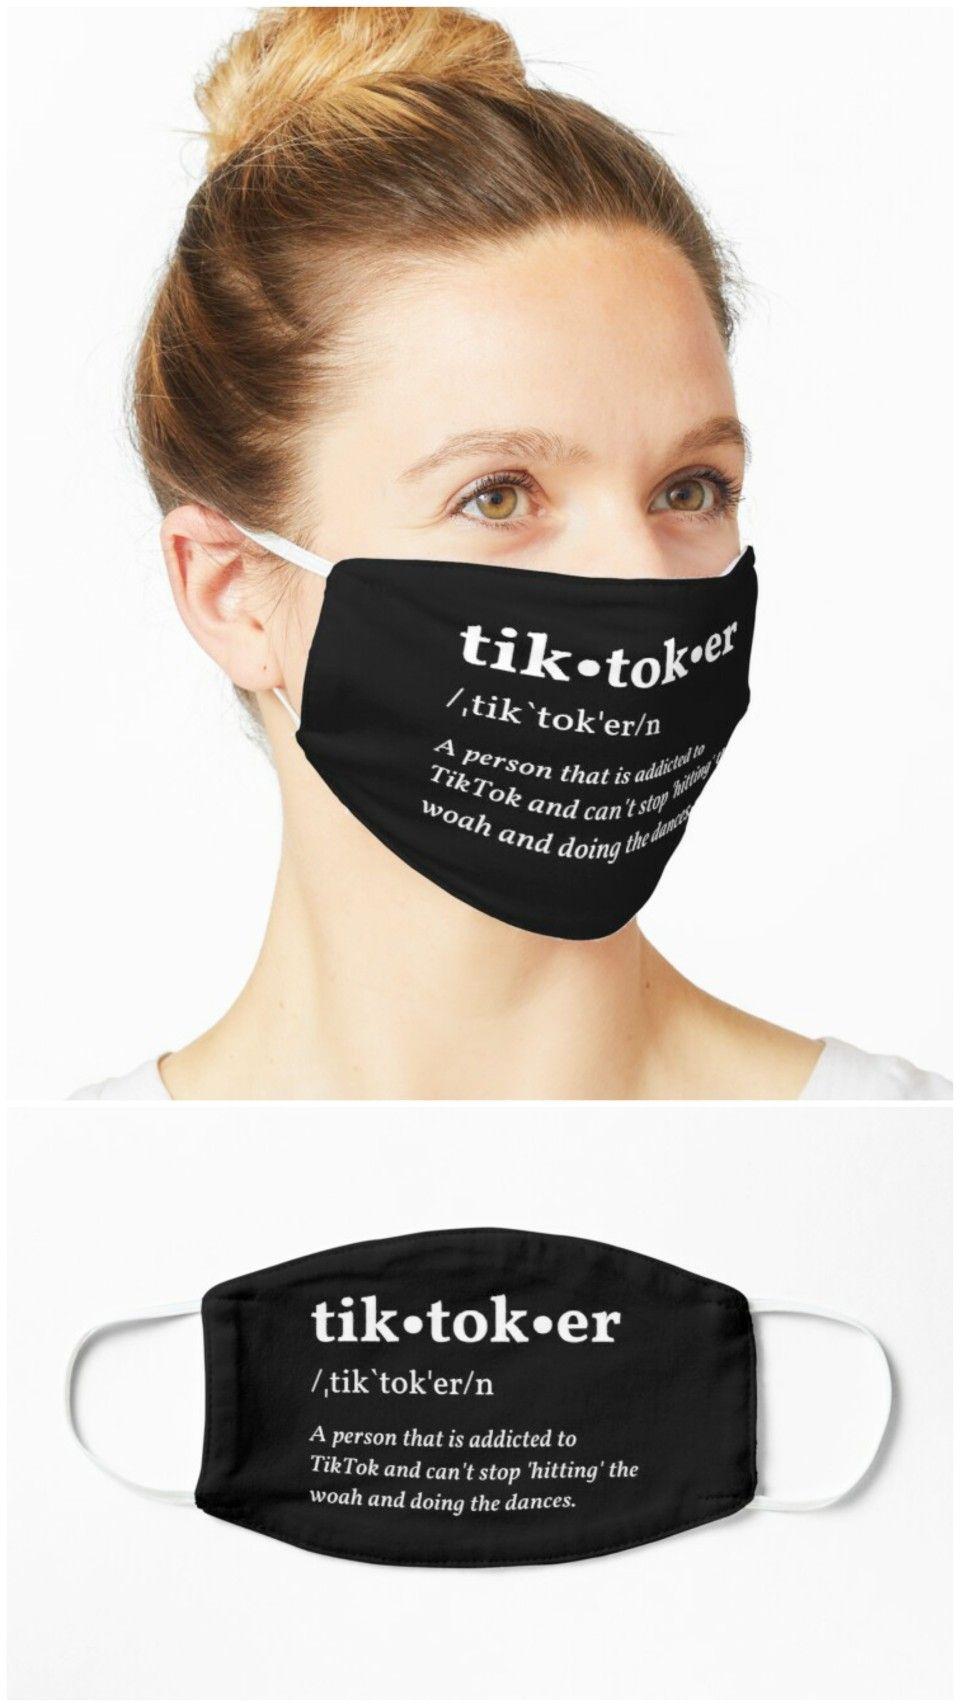 Tiktoker Definition Bring Back Tiktok Face Mask Mask Face Face Mask